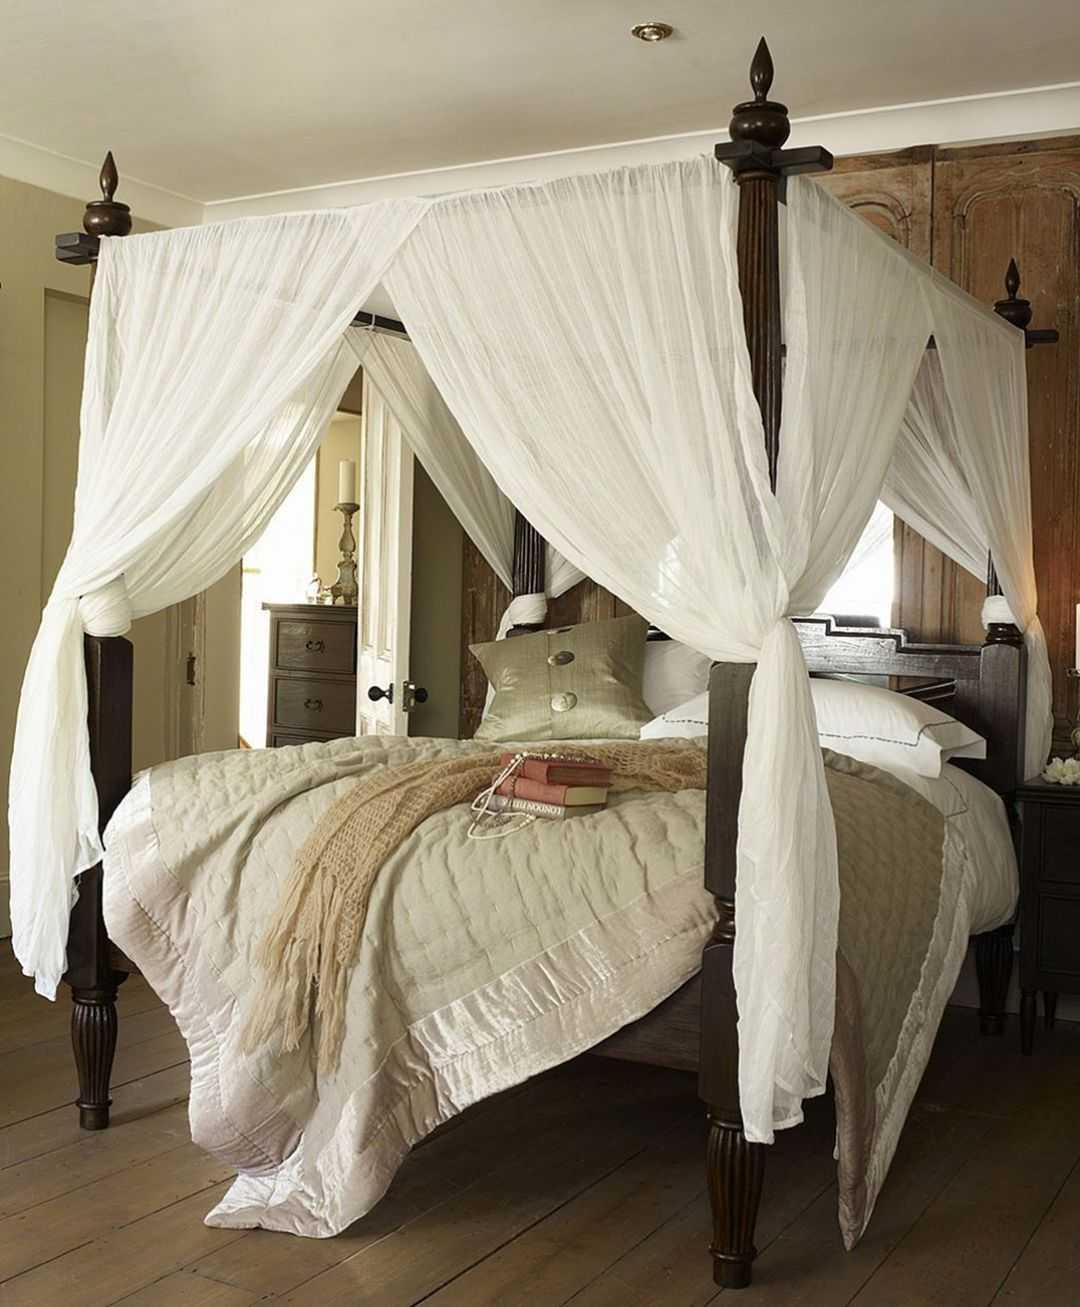 Балдахин над кроватью своими руками – мастер-класс пошагово